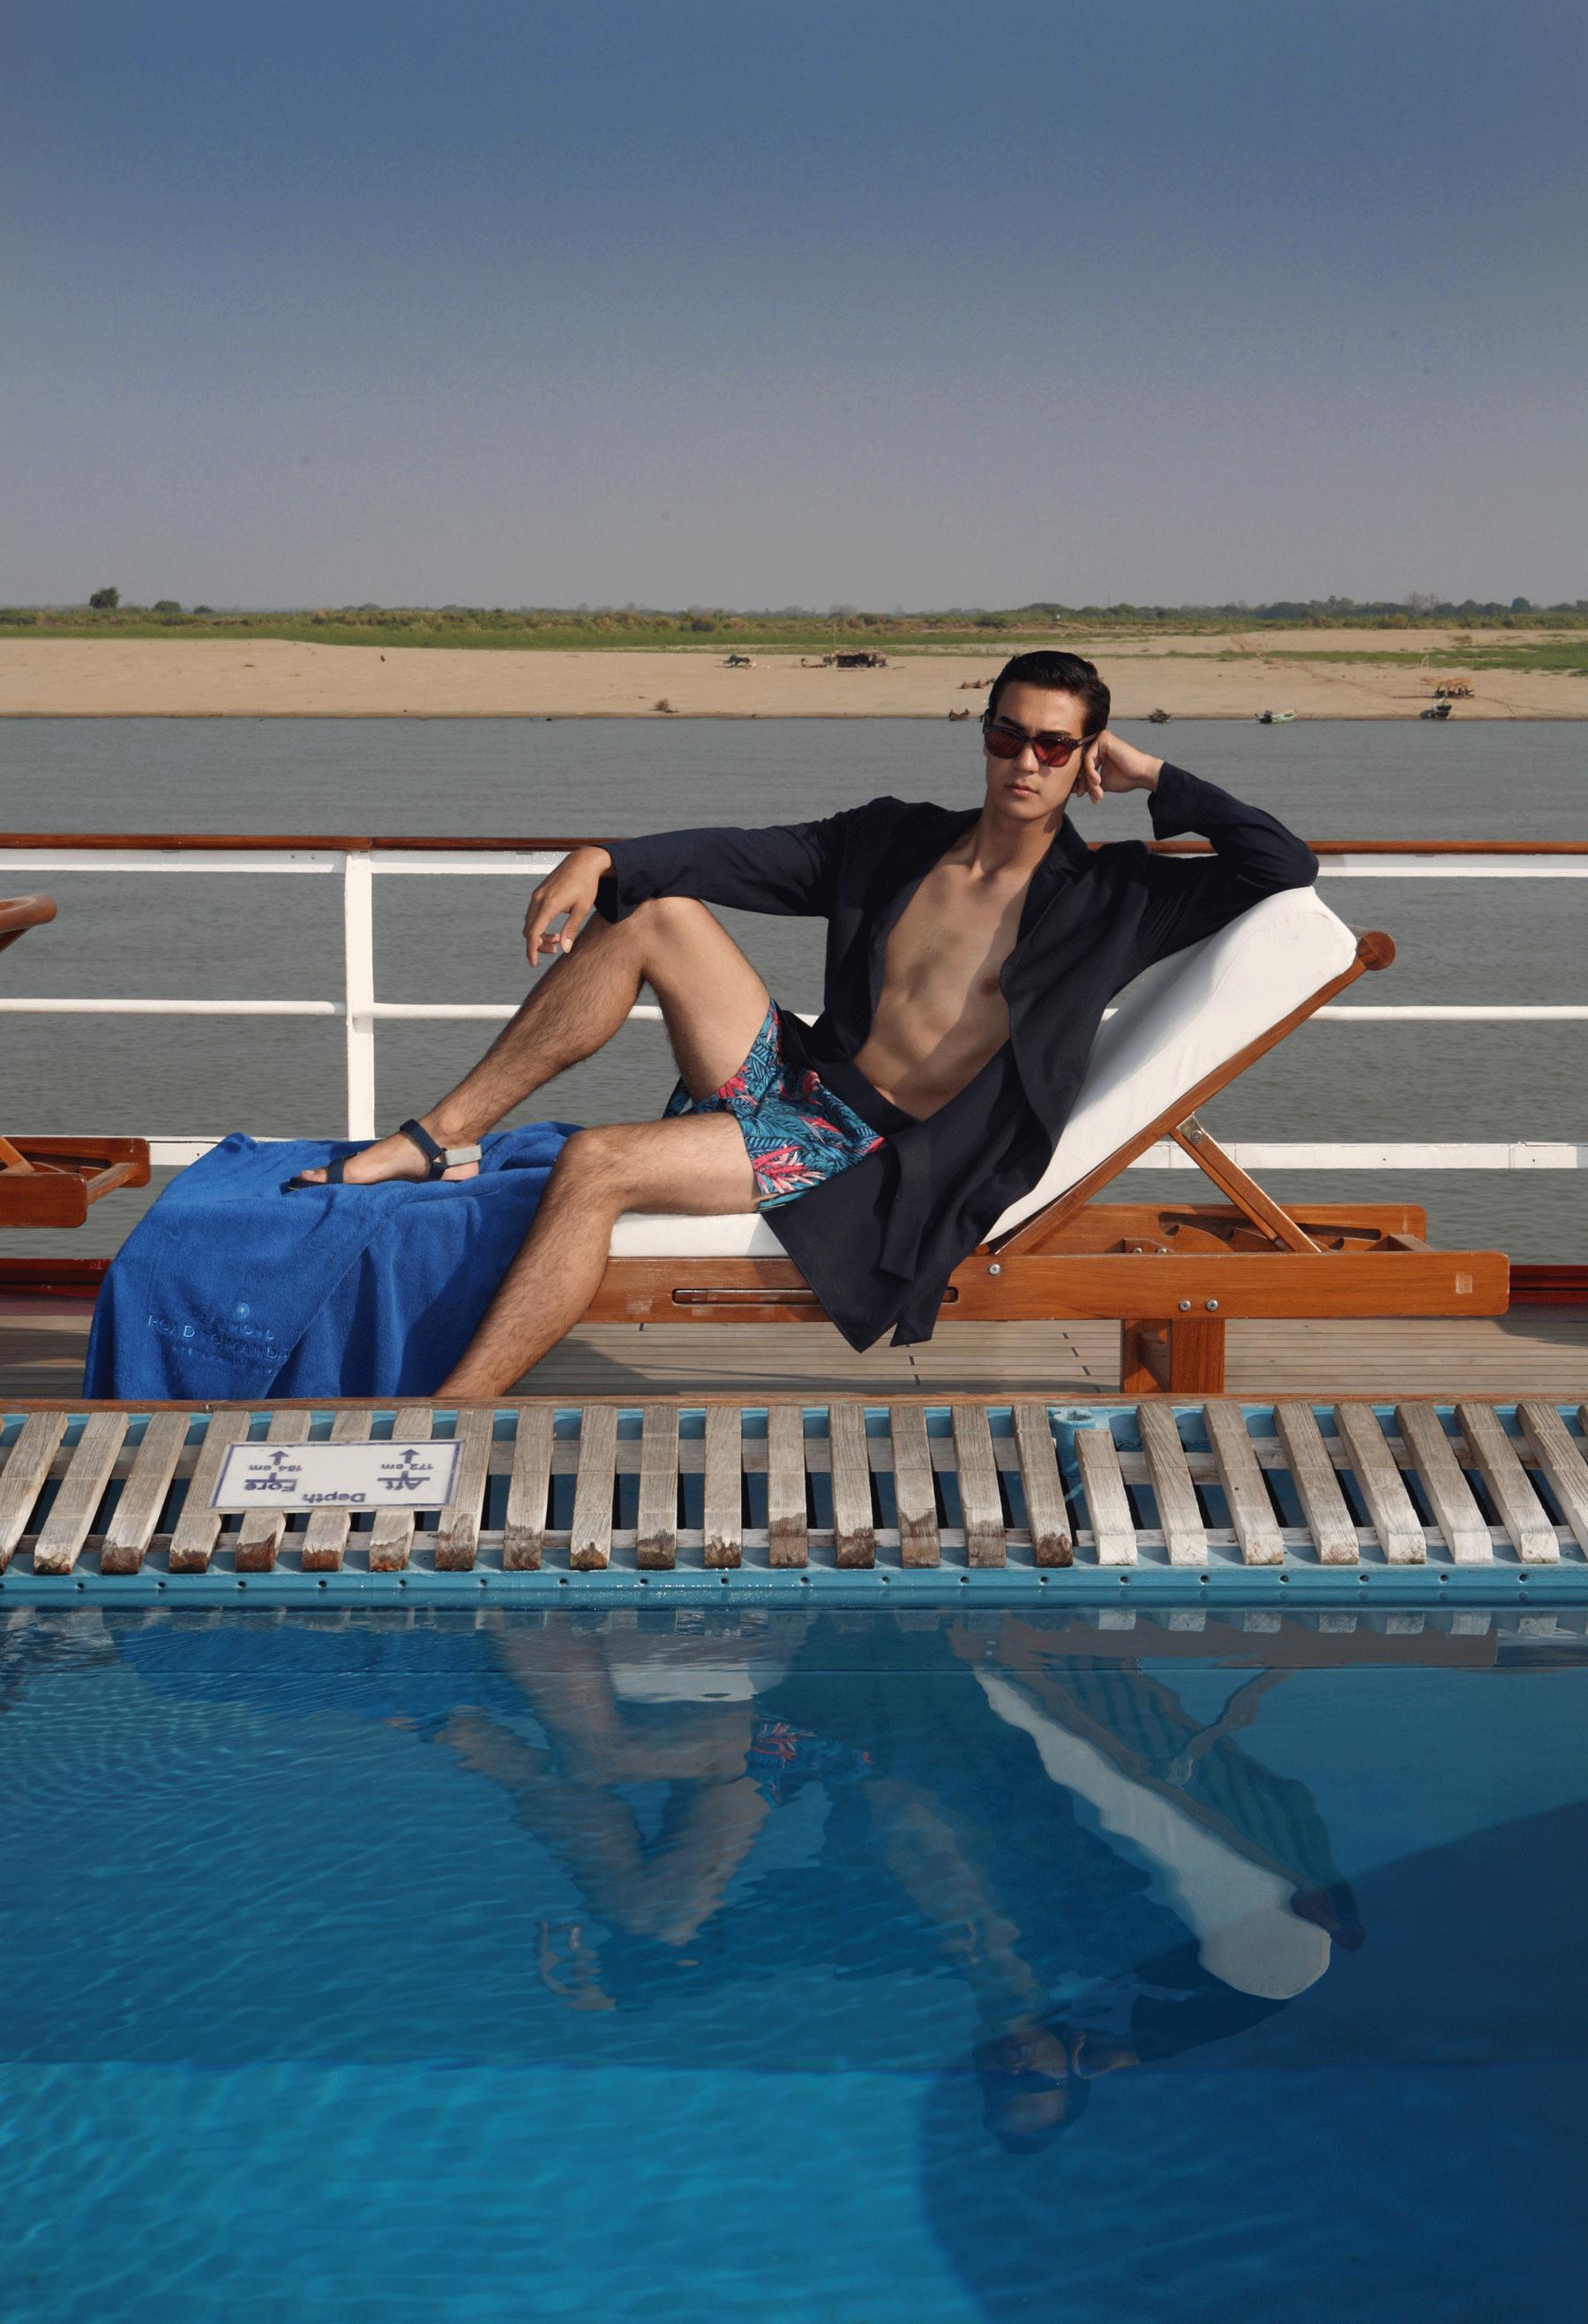 trunks : JOCKEY / robe : SARIT / sunglasses : SPEKTRE